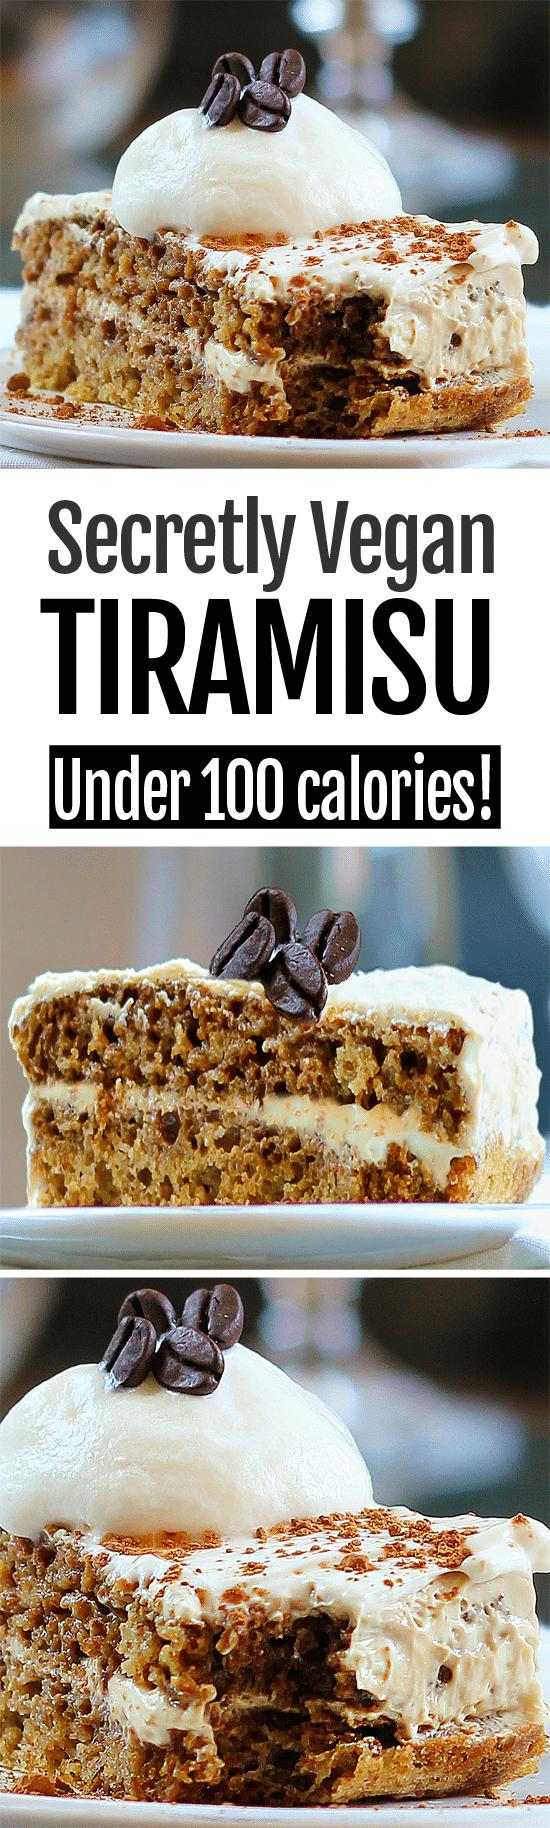 Secretly Vegan Healthy Tiramisu Recipe